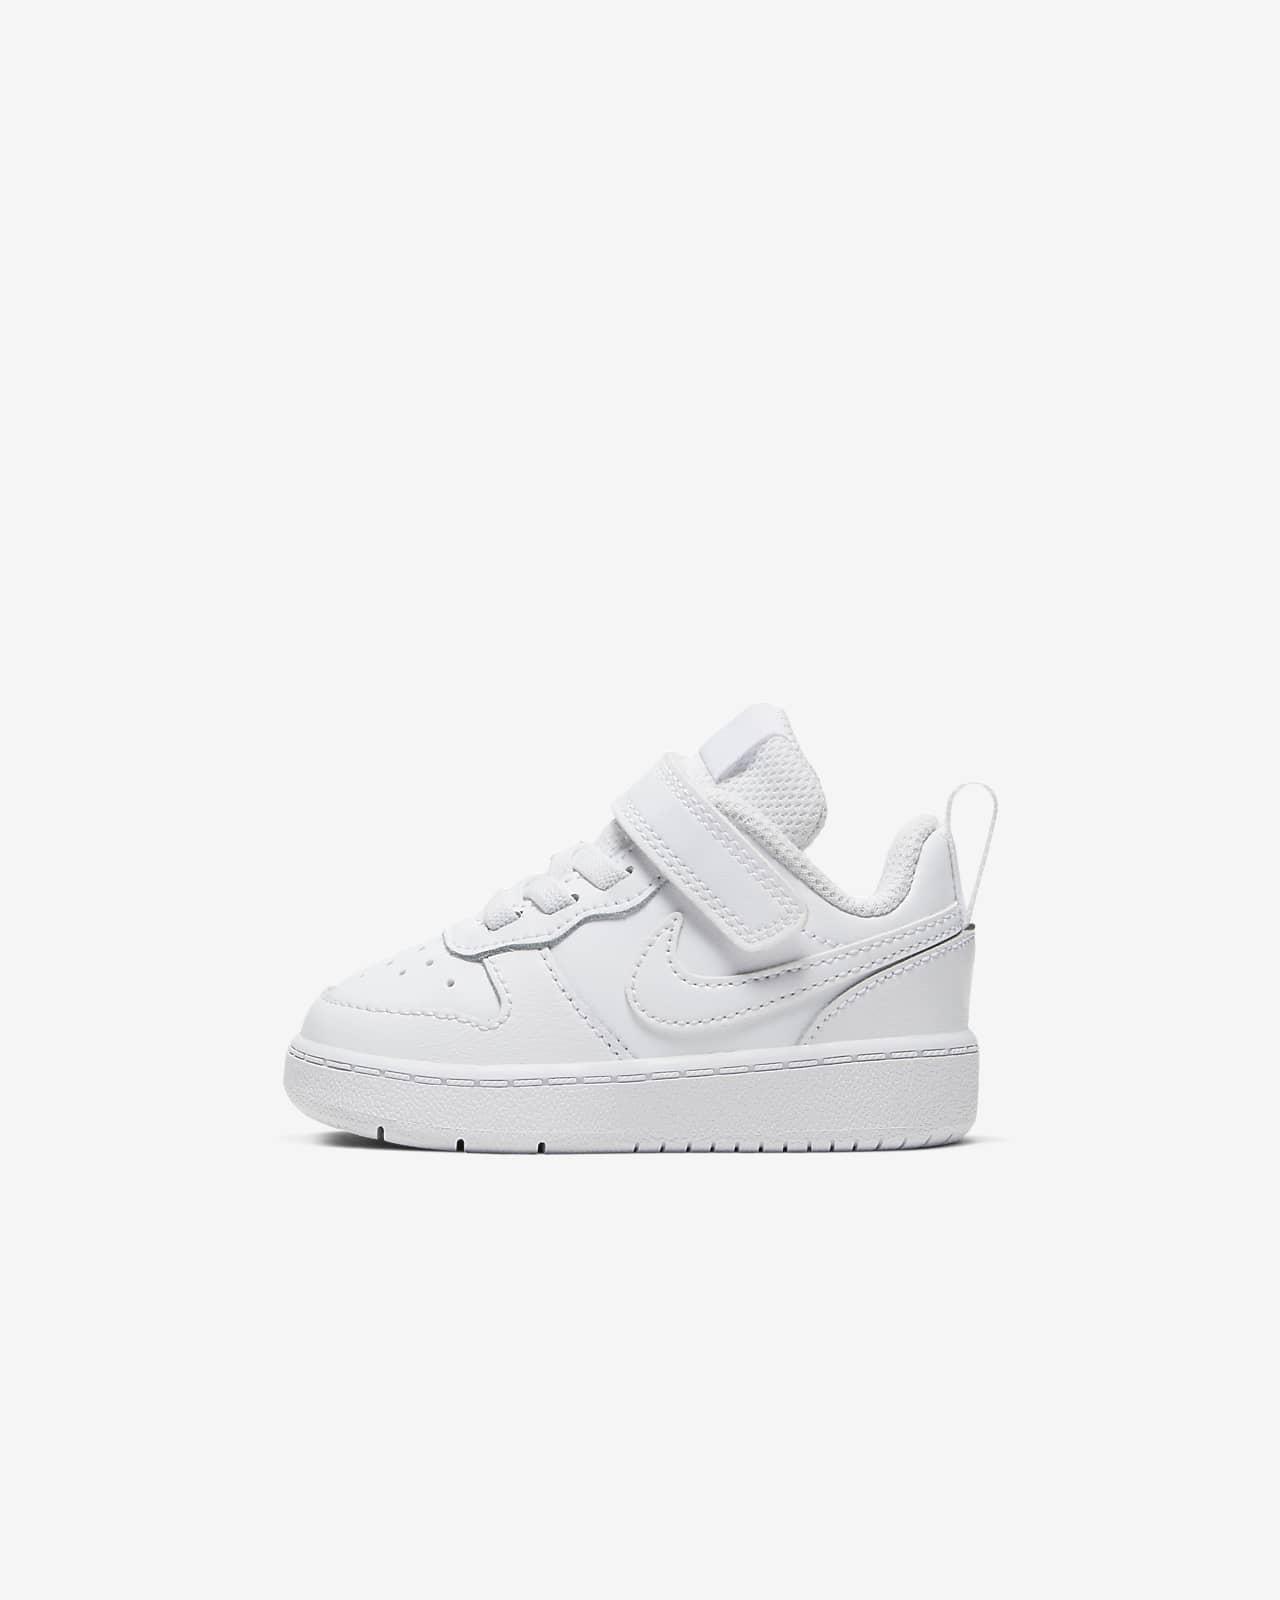 Nike Court Borough Low 2 Sabatilles - Nadó i infant